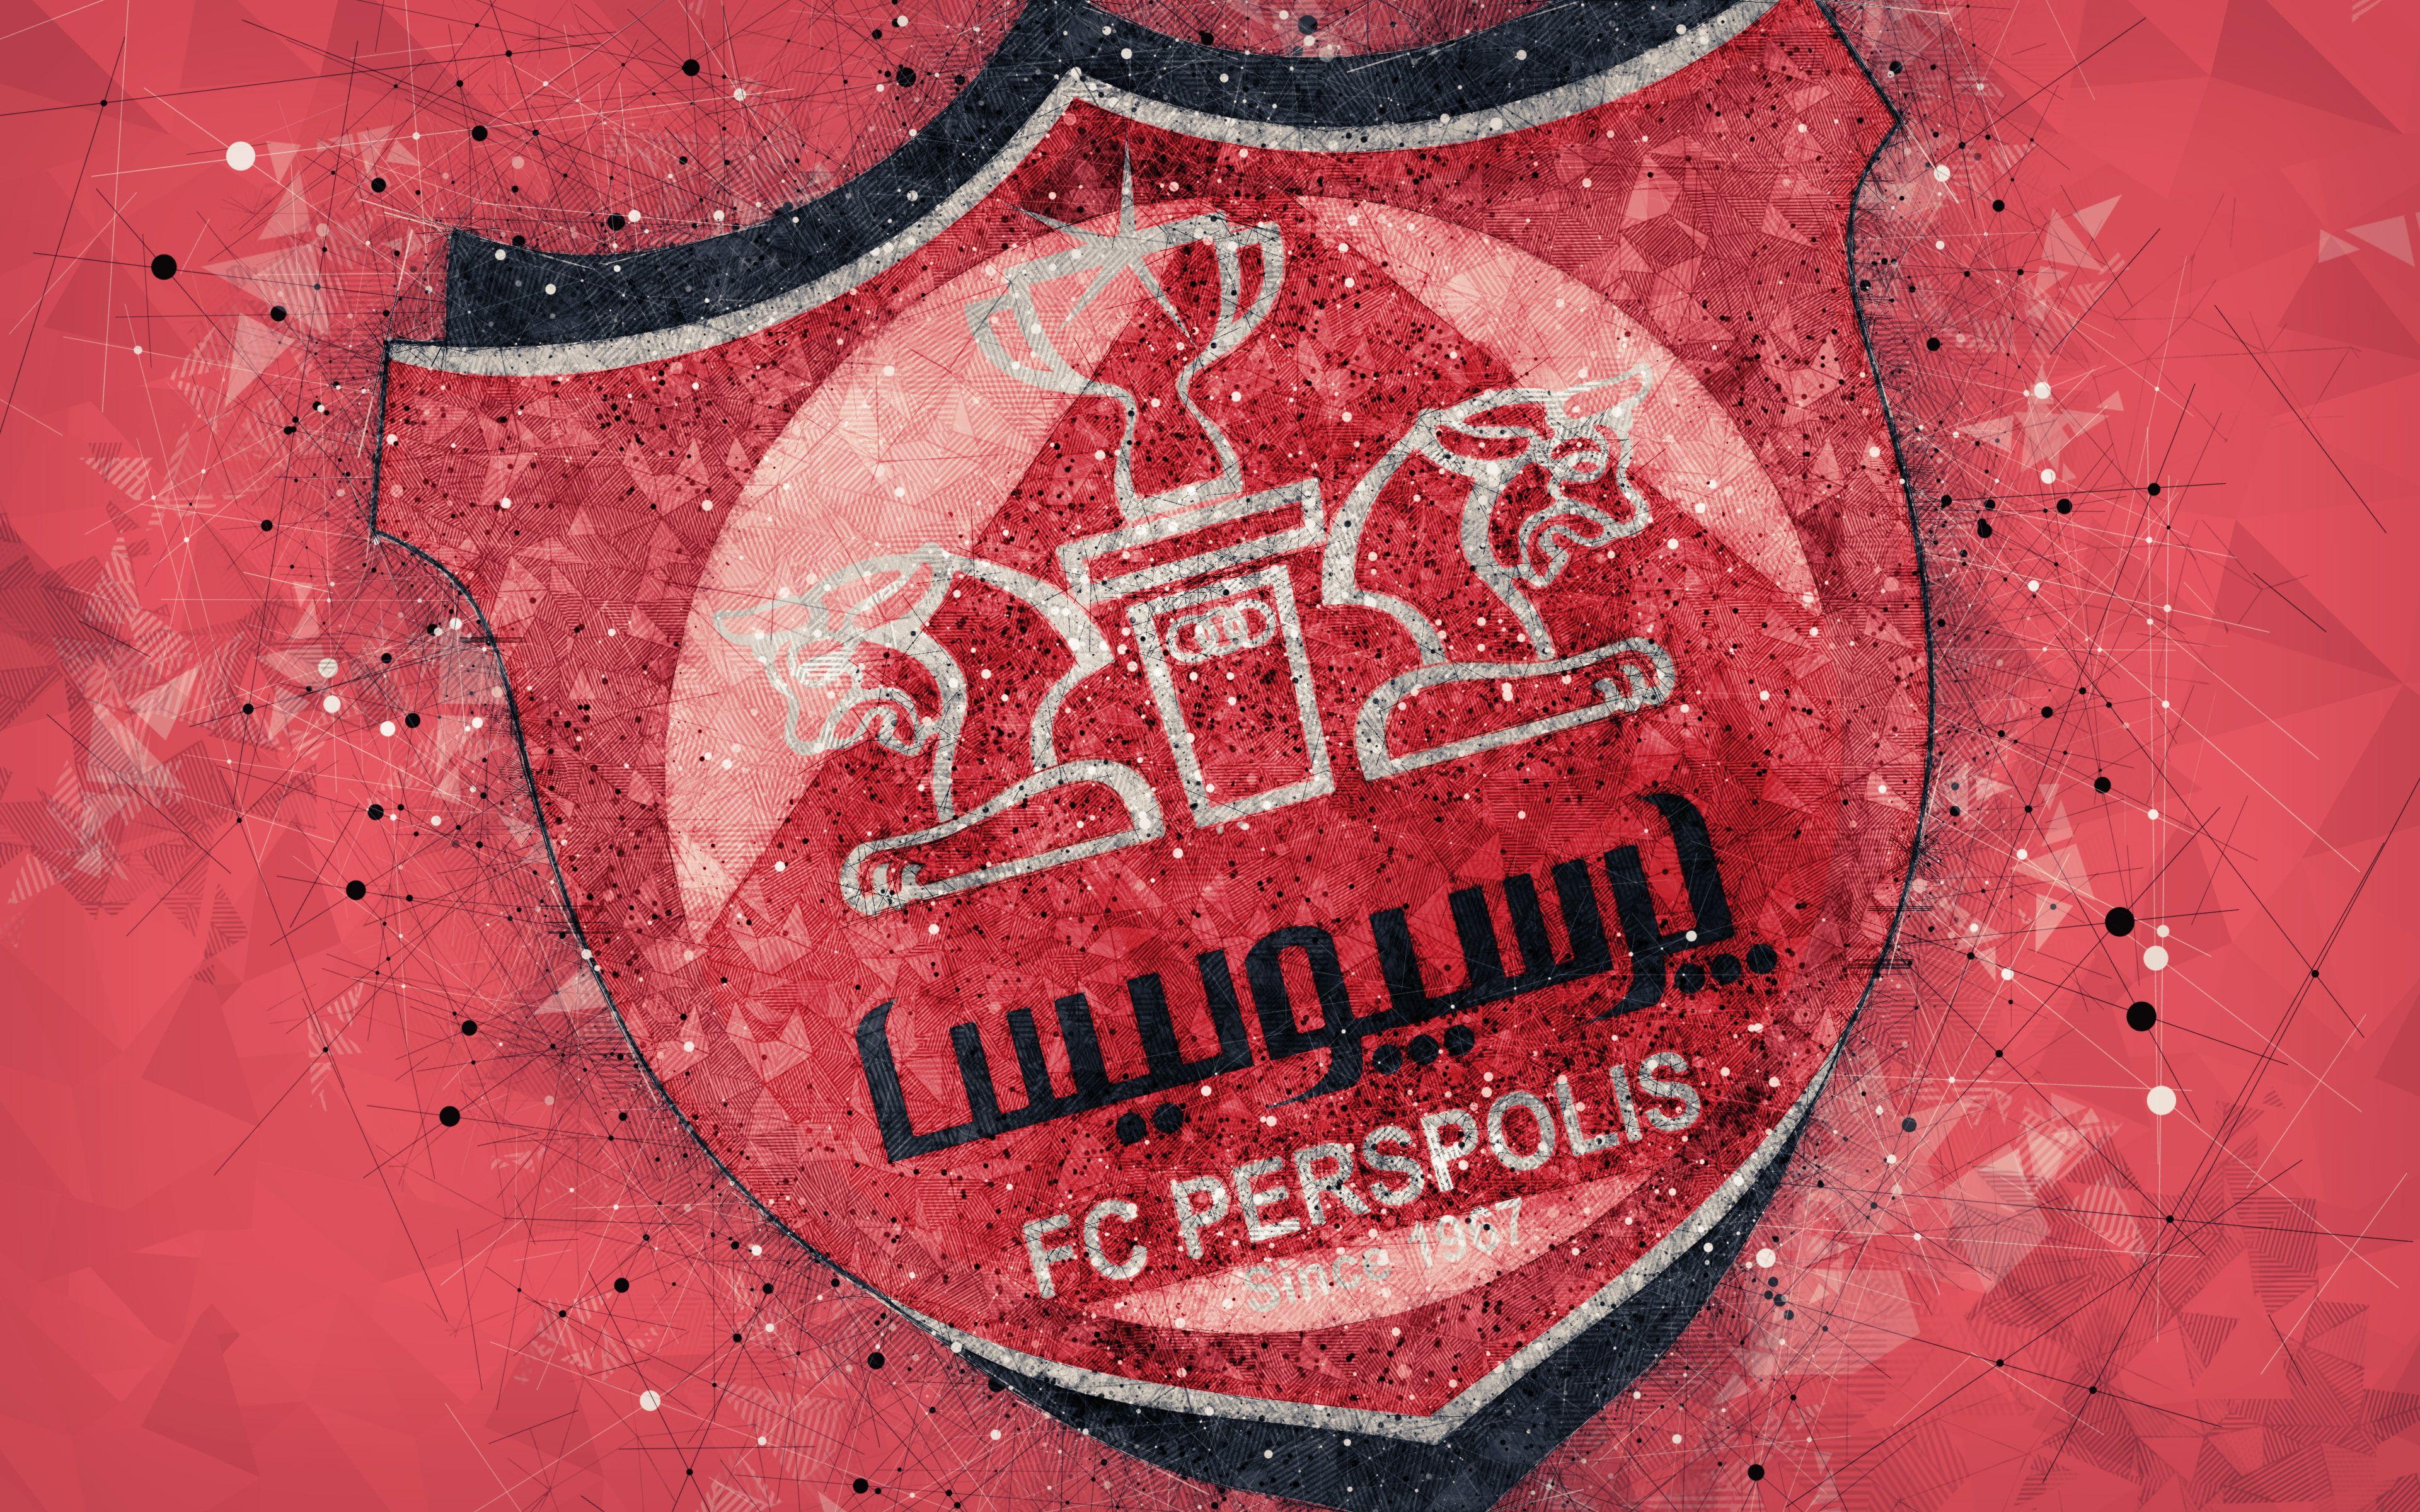 Soccer Persepolis F C 4k Wallpaper Hdwallpaper Desktop Hd Wallpaper Best Camera For Photography Wallpaper